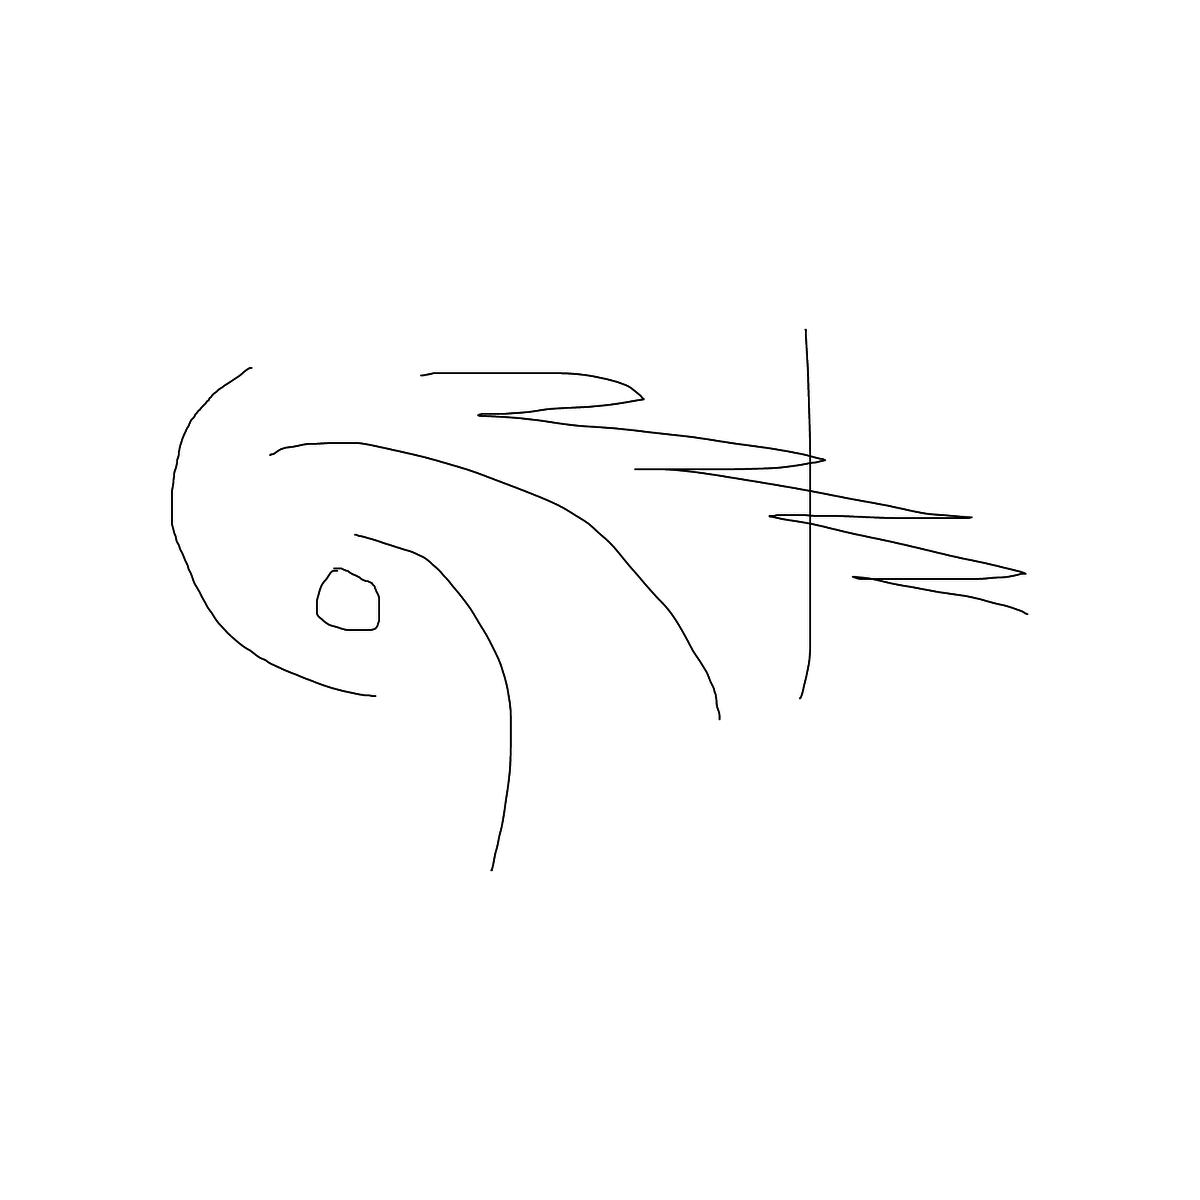 BAAAM drawing#2606 lat:45.3894004821777340lng: -75.6943664550781200